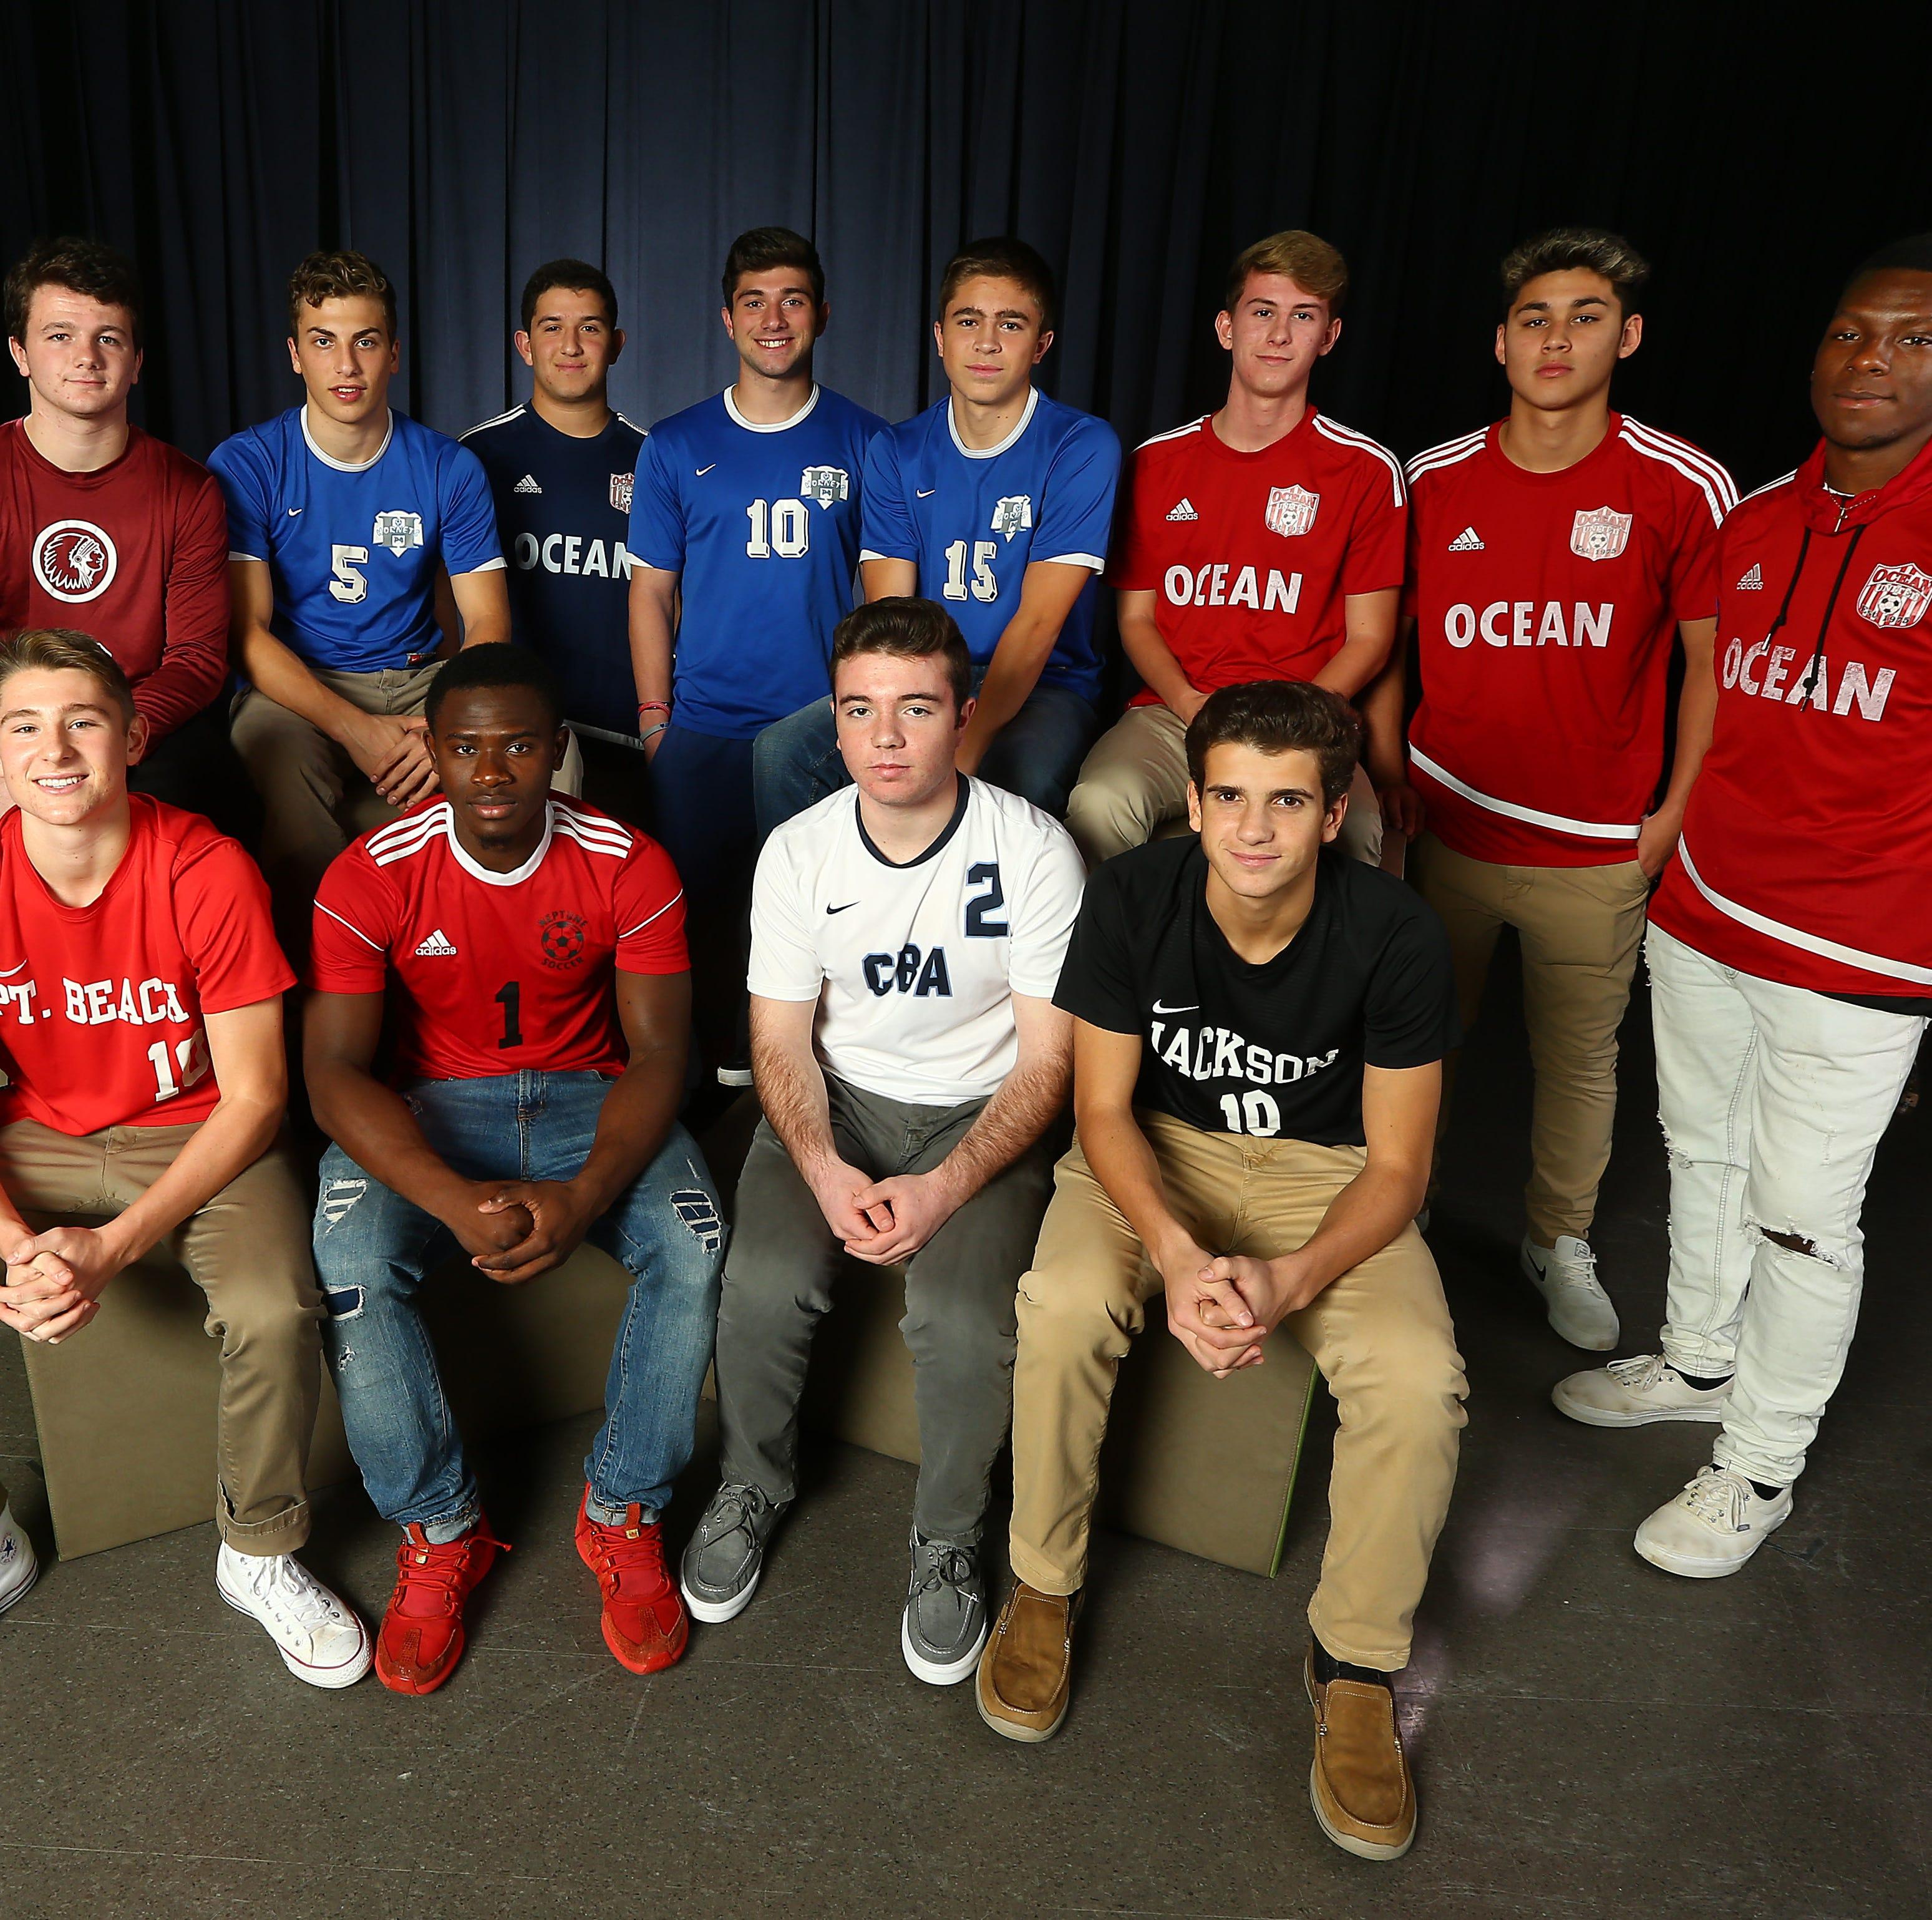 NJ boys soccer: Meet the 2018 All-Shore teams